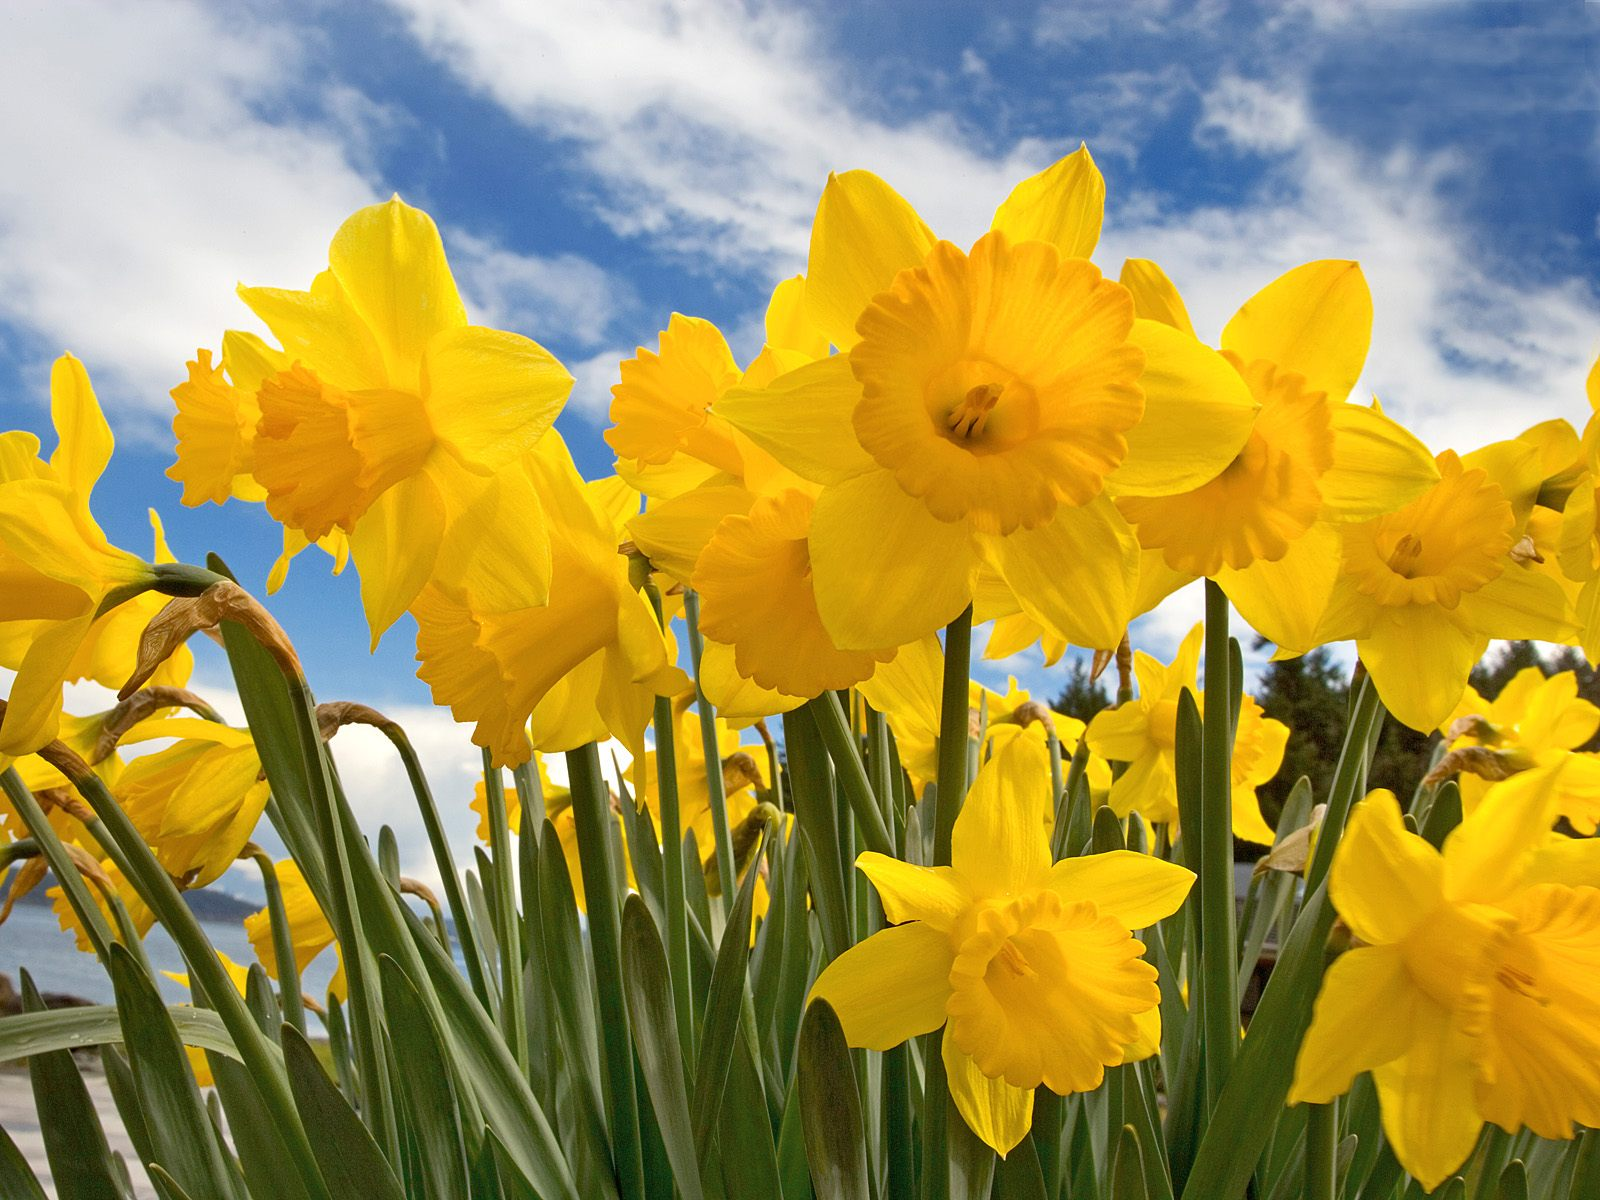 daffodil - photo #2